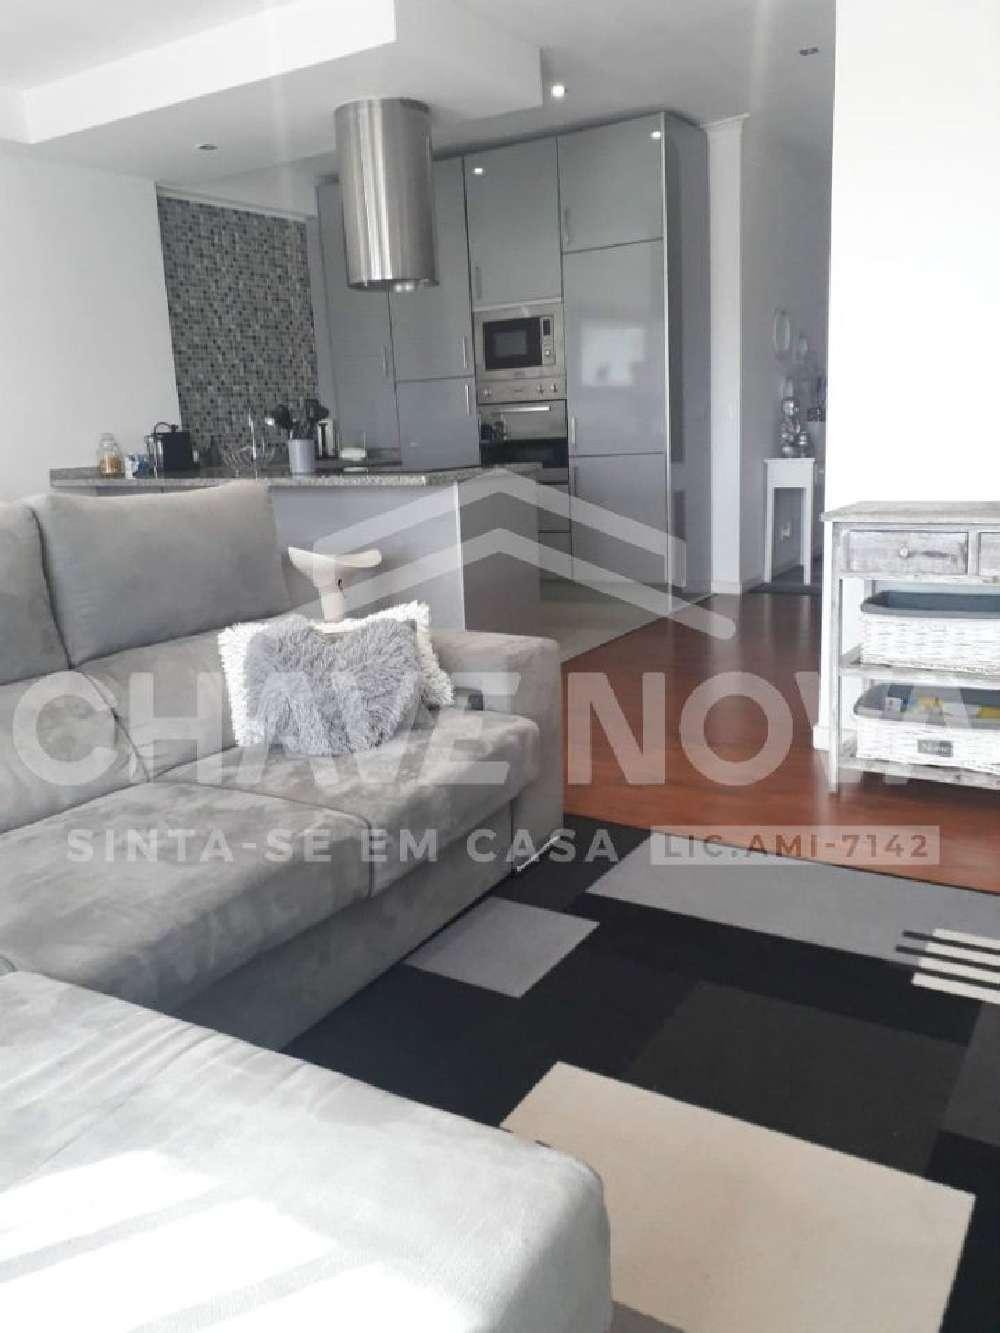 São Pedro Nordeste lägenhet photo 169728